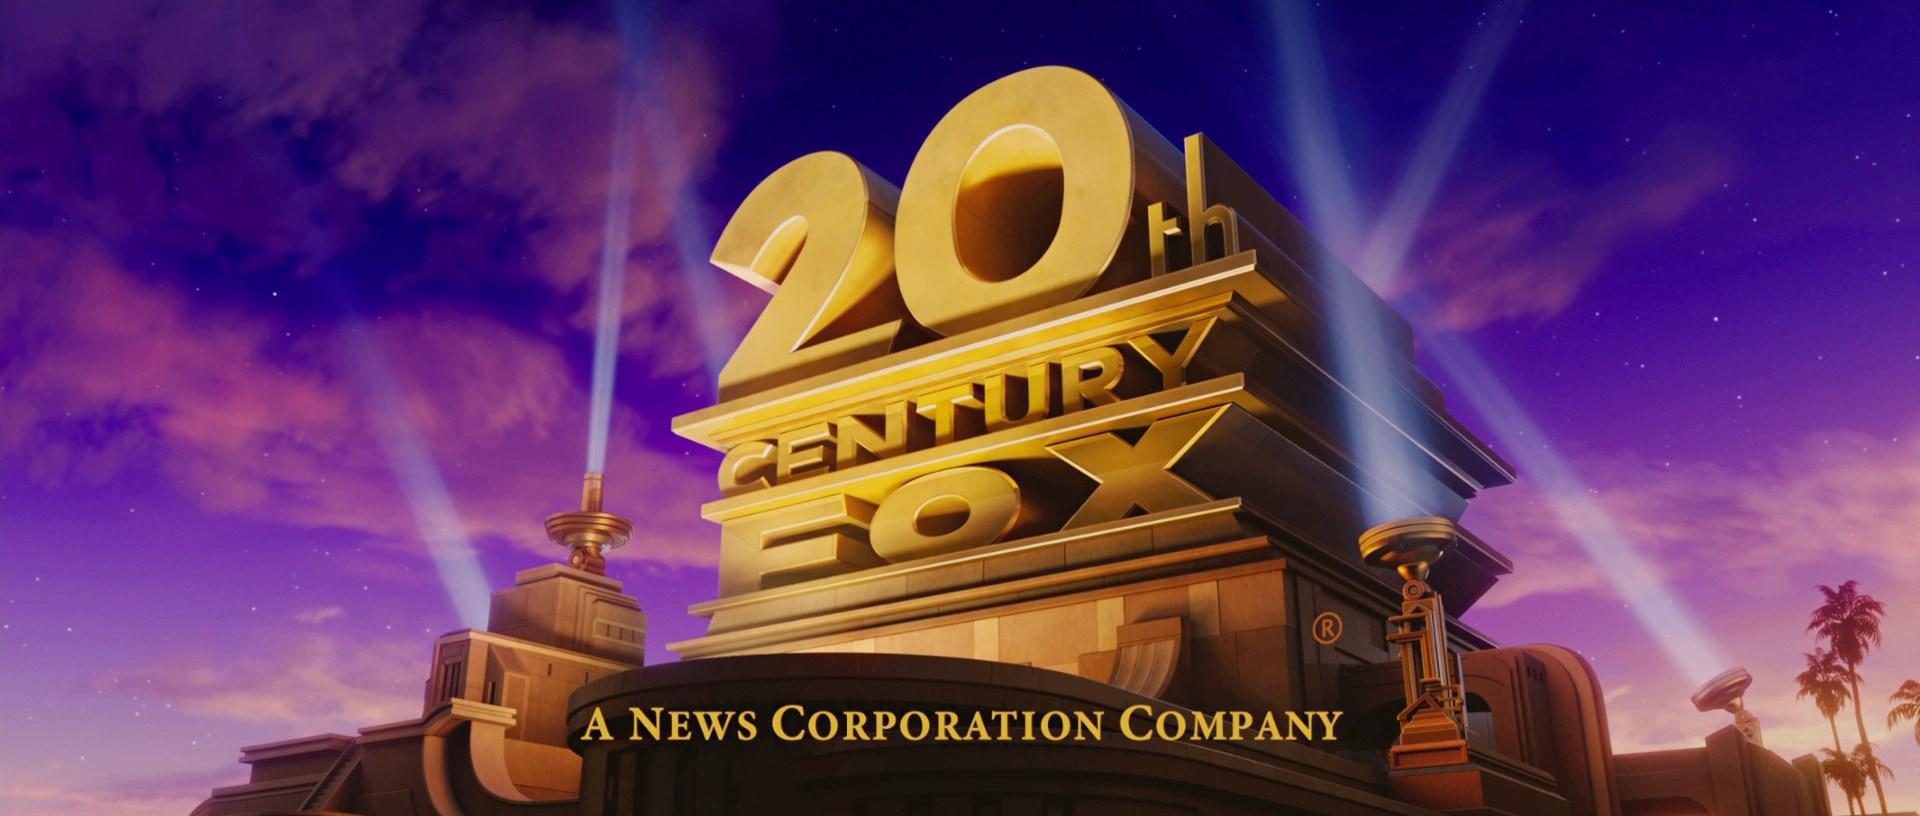 20th Animation Twentieth Century Fox